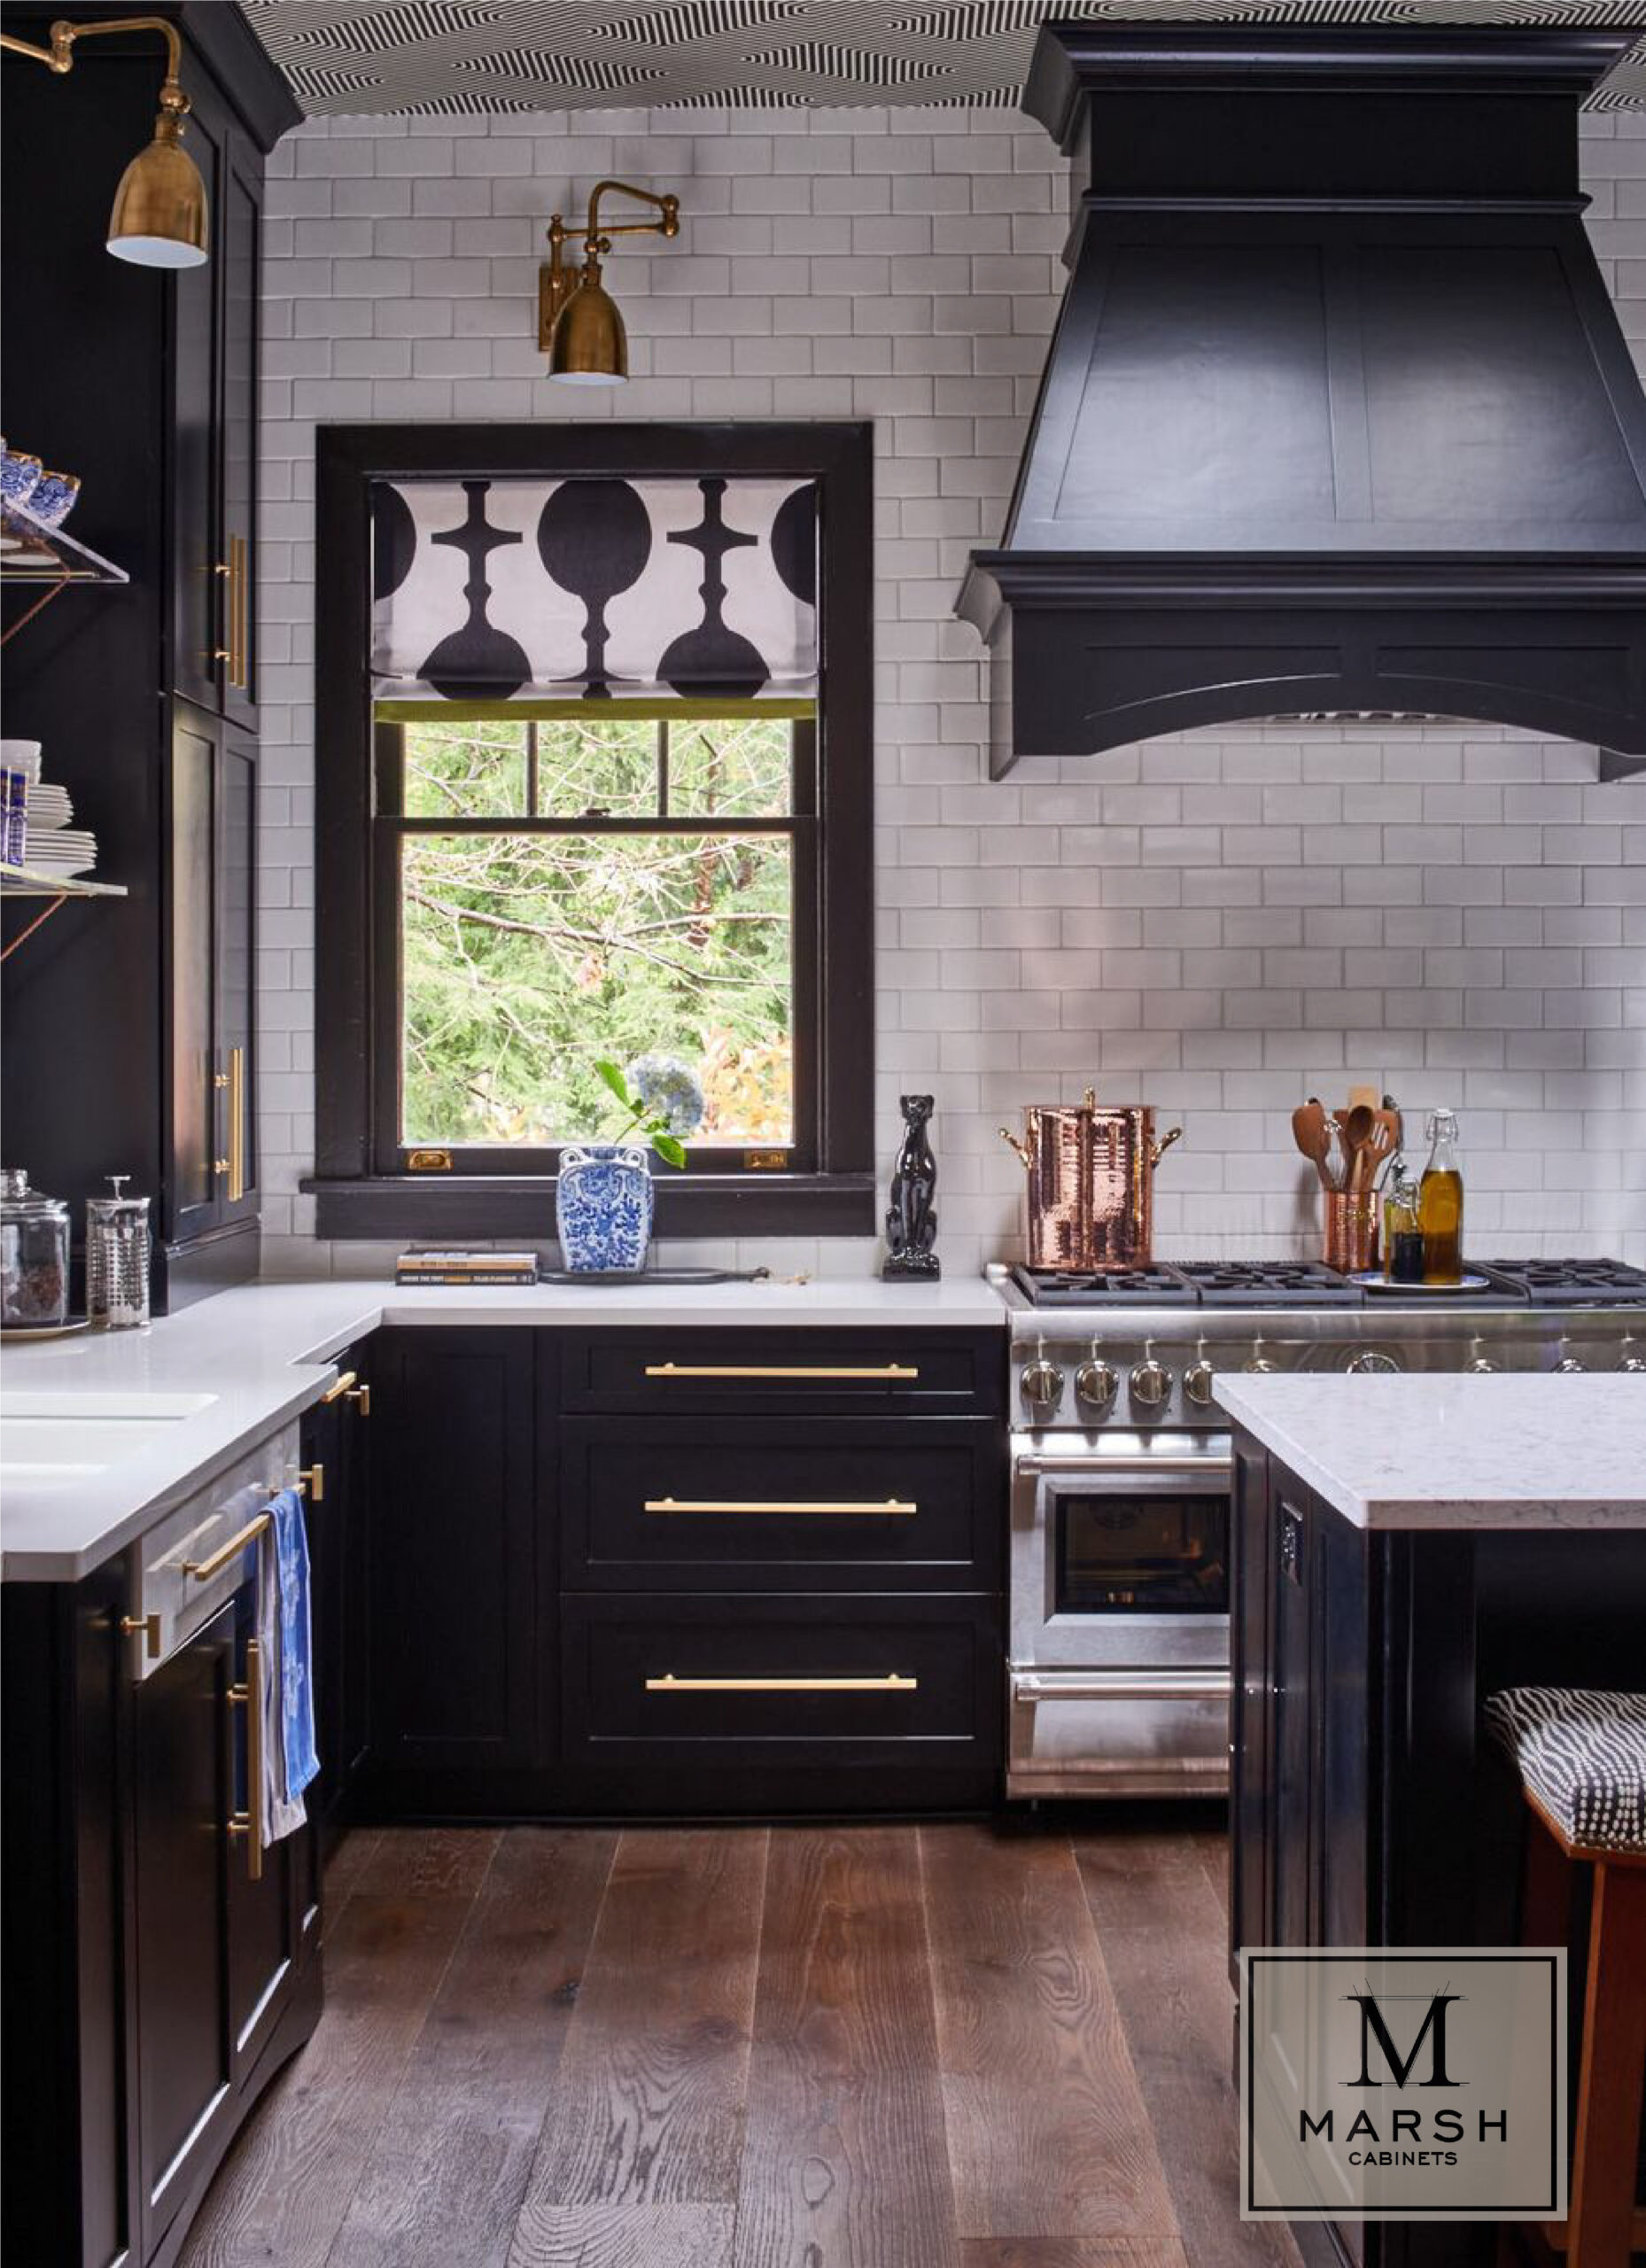 Kitchen Cabinets Raleigh Modern Espresso Wood Hood Bar Pulls Gold Hardware Tile